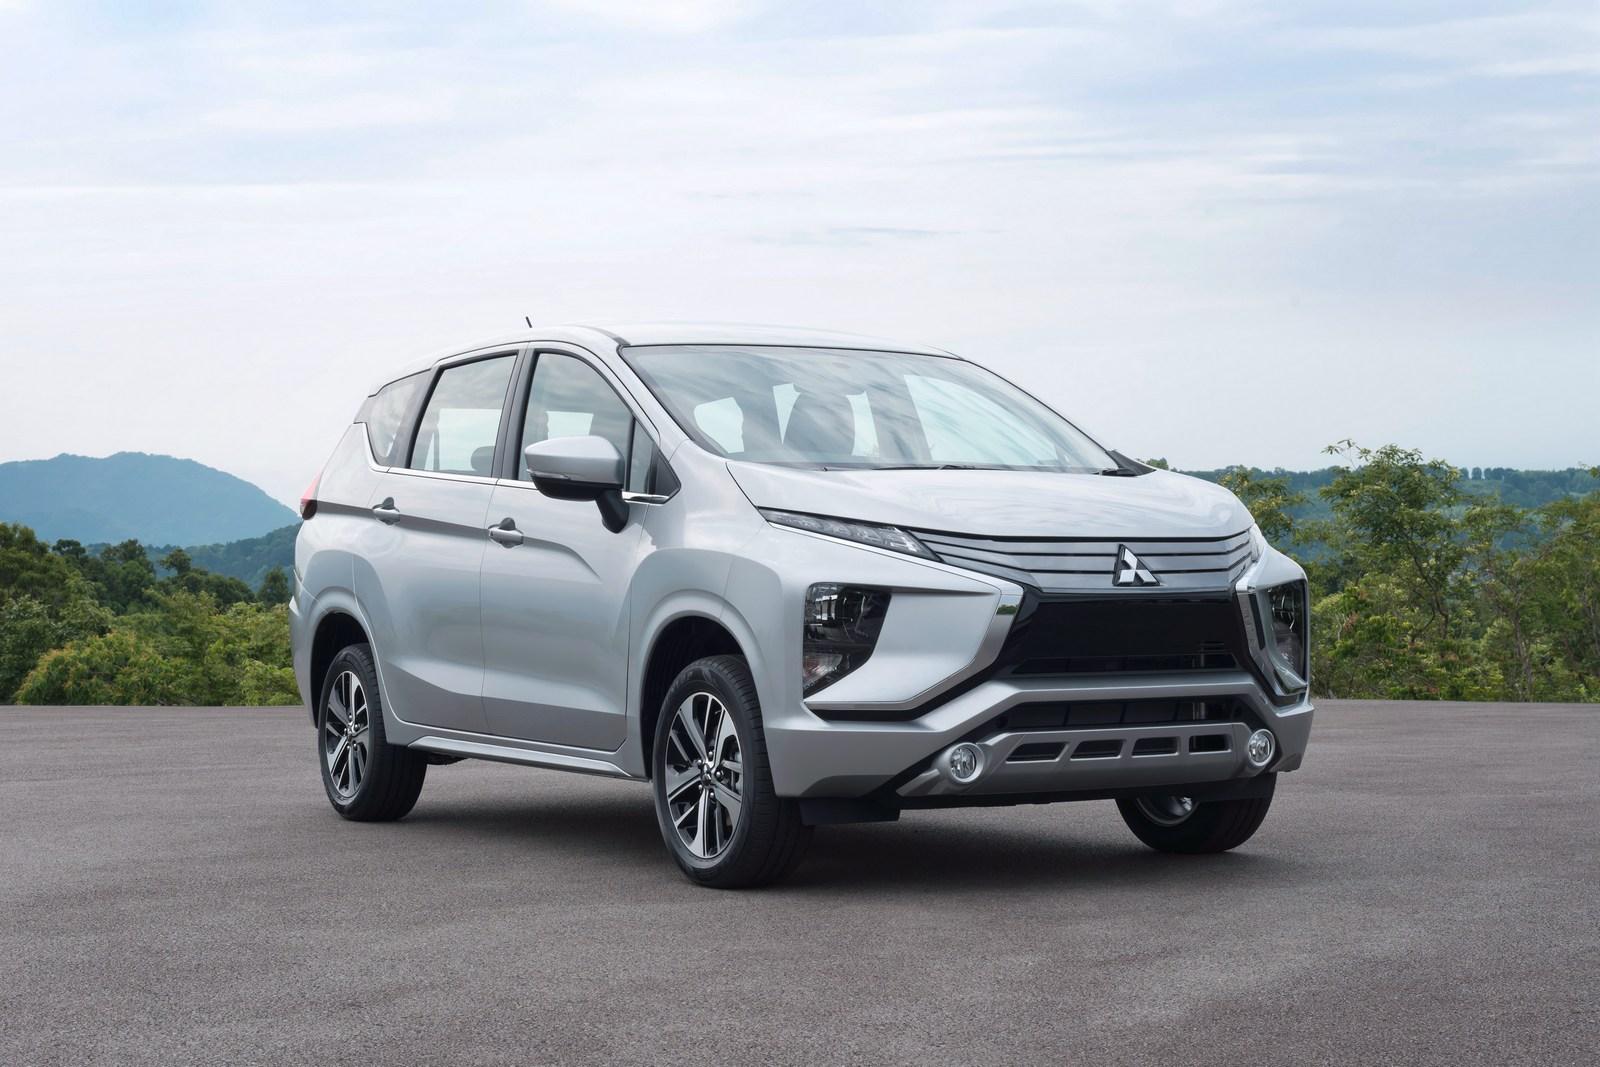 Review Grand New Veloz 1.5 Perbedaan 1.3 Dan All Mitsubishi Xpander Debuts In Indonesia Carscoops